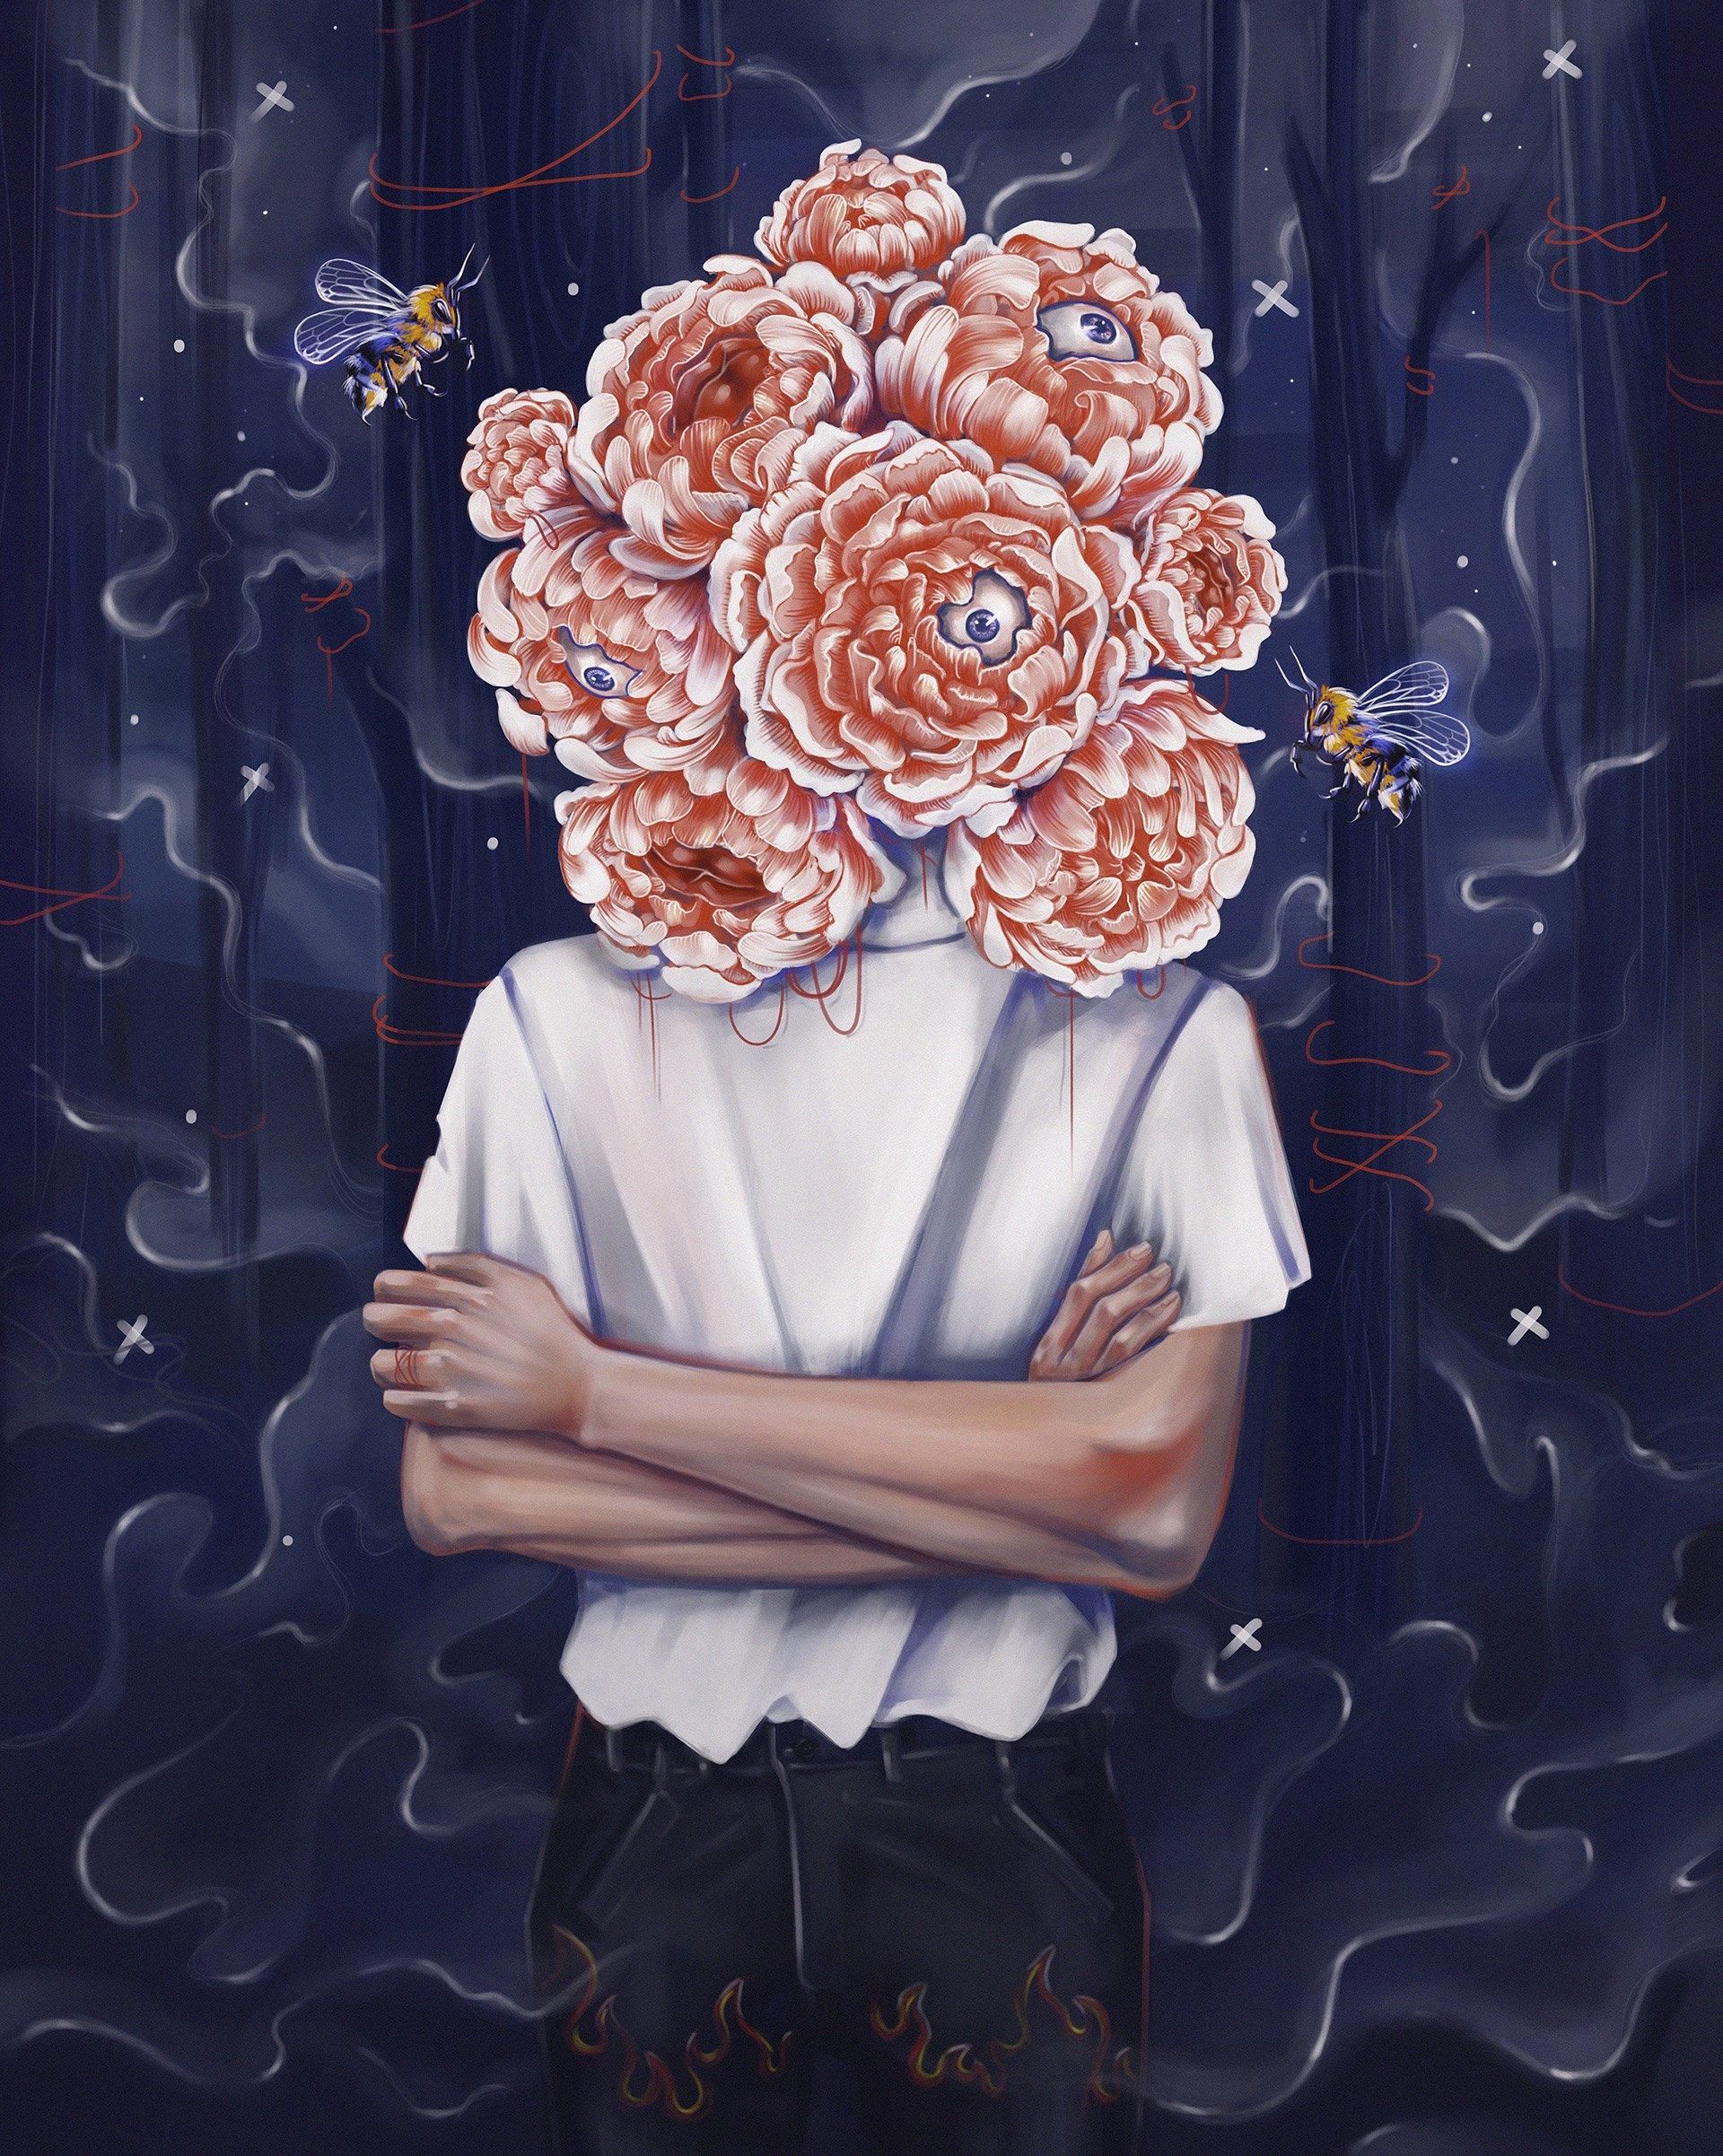 Ioana Harasim超现实风格插画作品